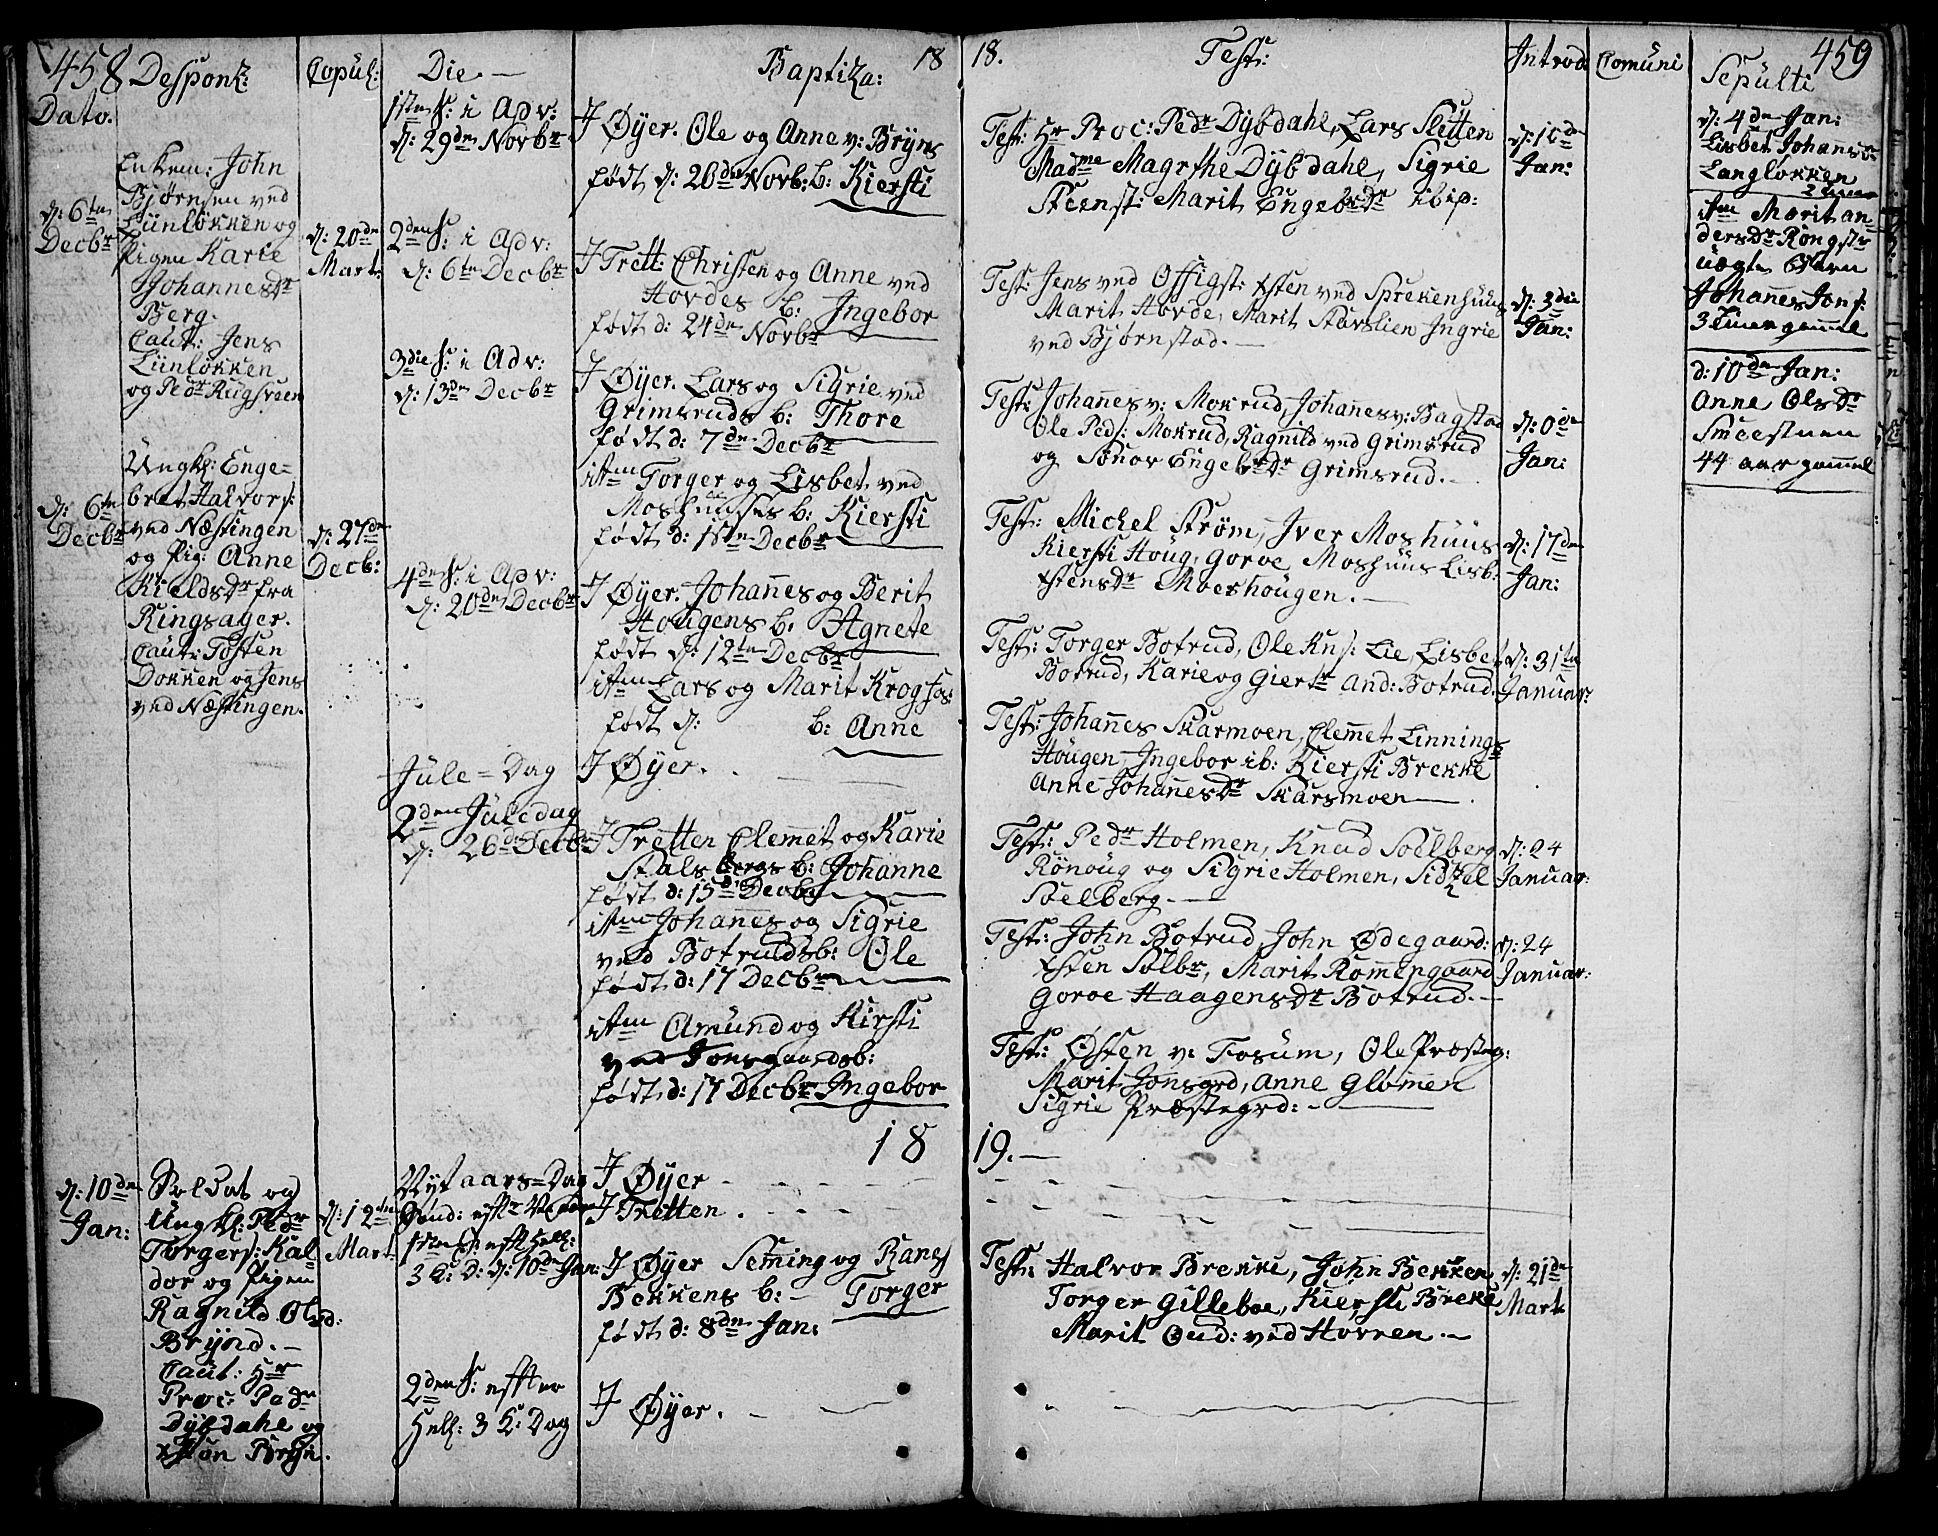 SAH, Øyer prestekontor, Ministerialbok nr. 3, 1784-1824, s. 458-459